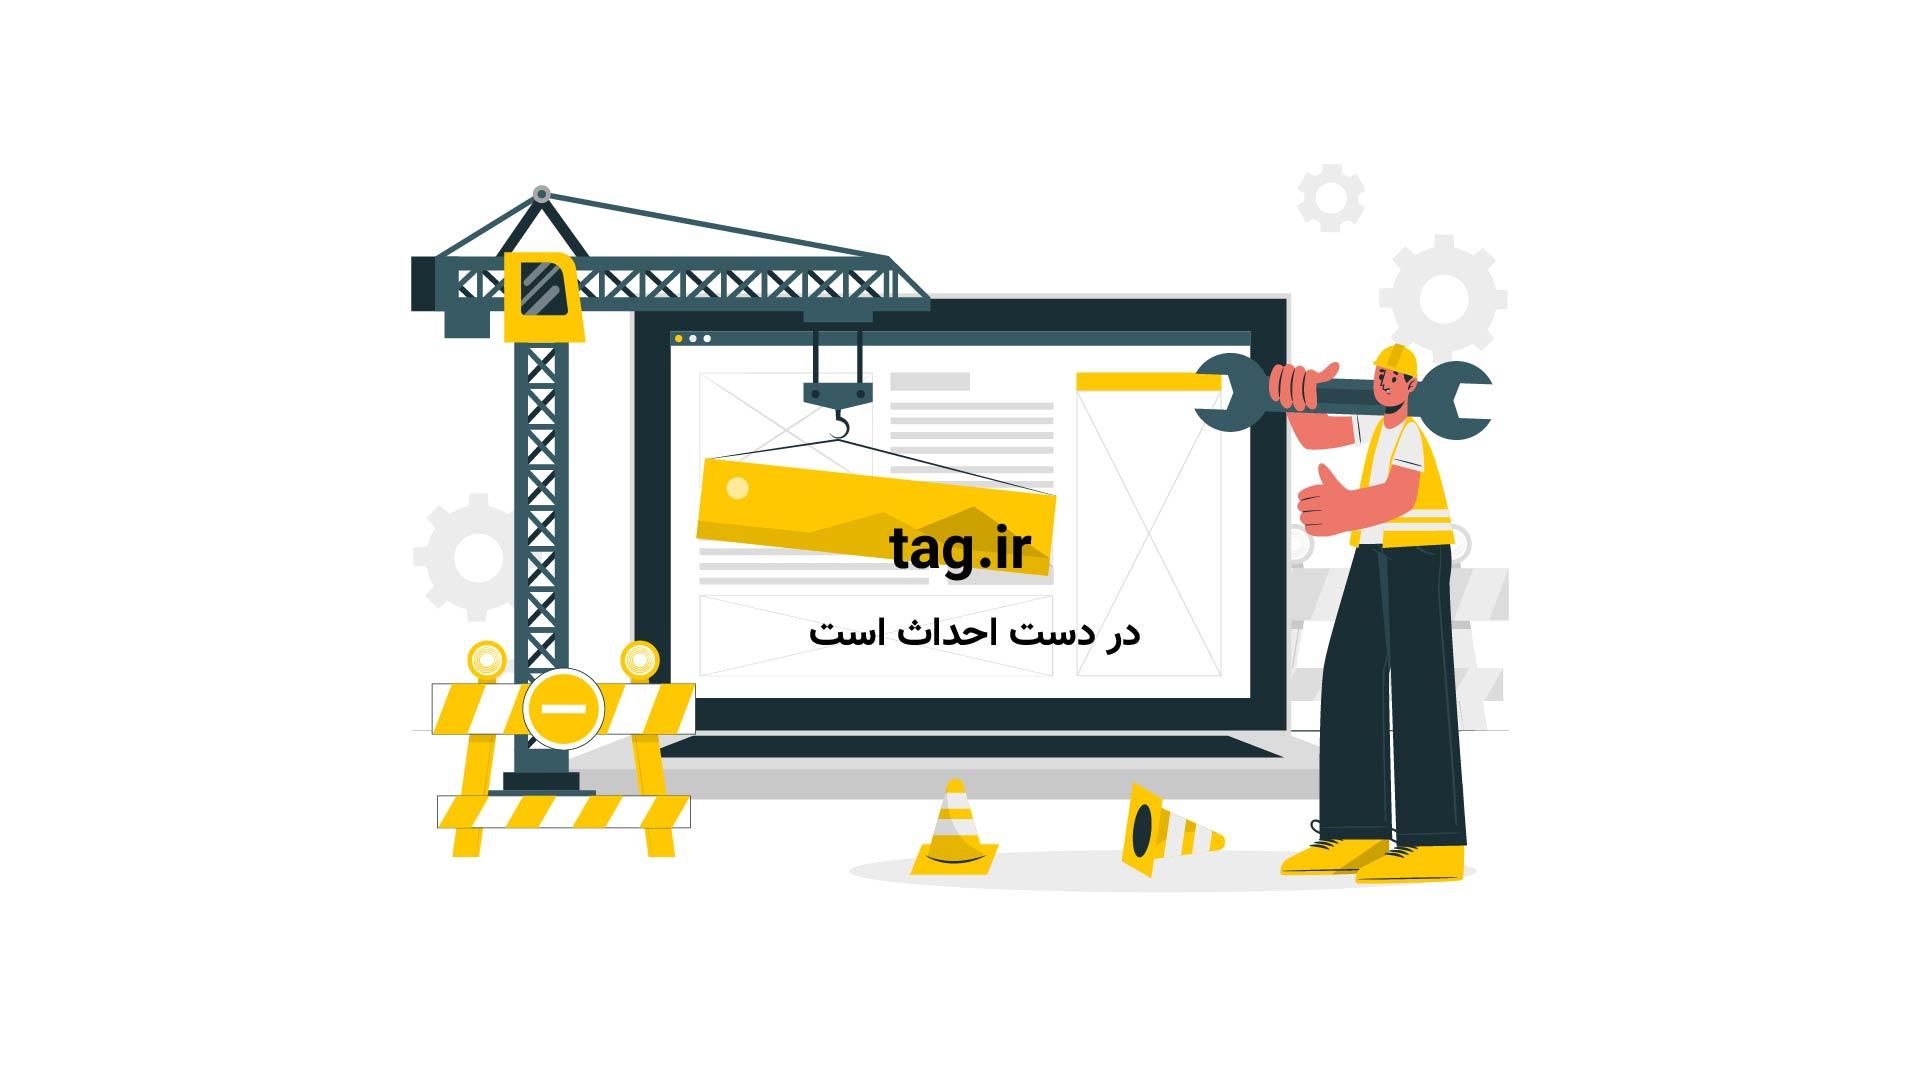 کیک شکلاتی خیس | تگ